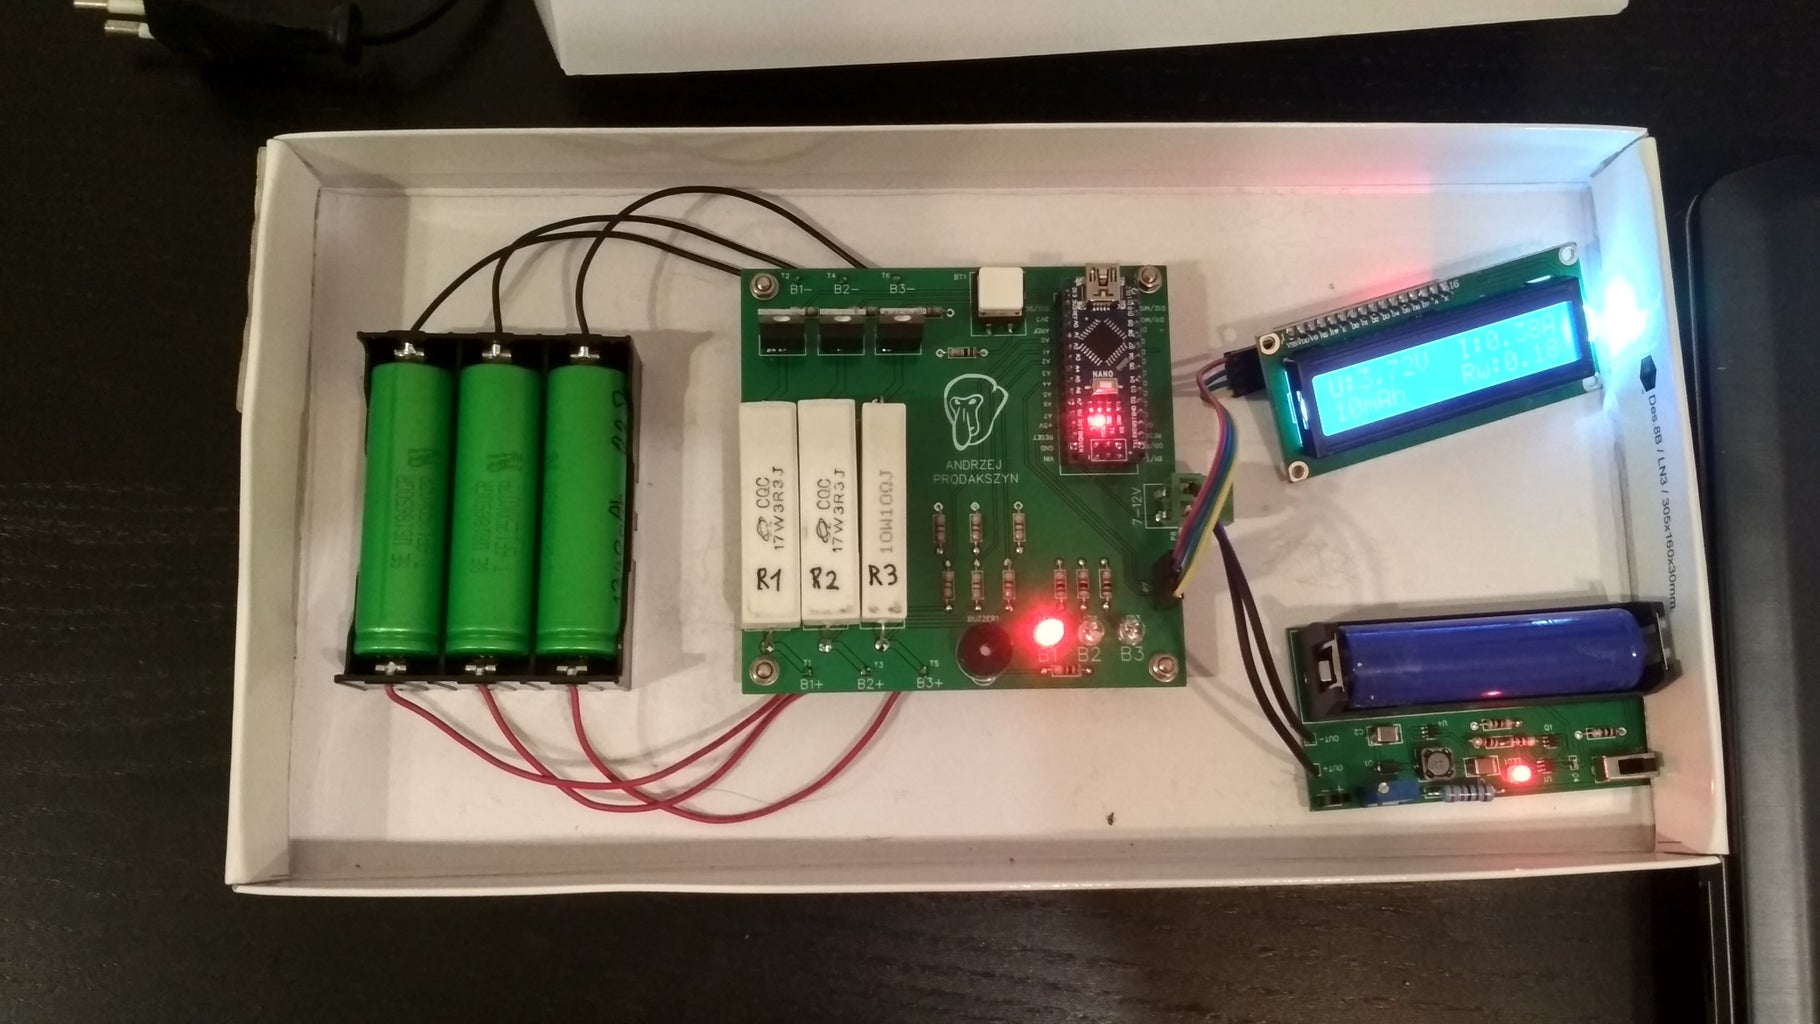 3 X 18650 Battery Capacity Tester